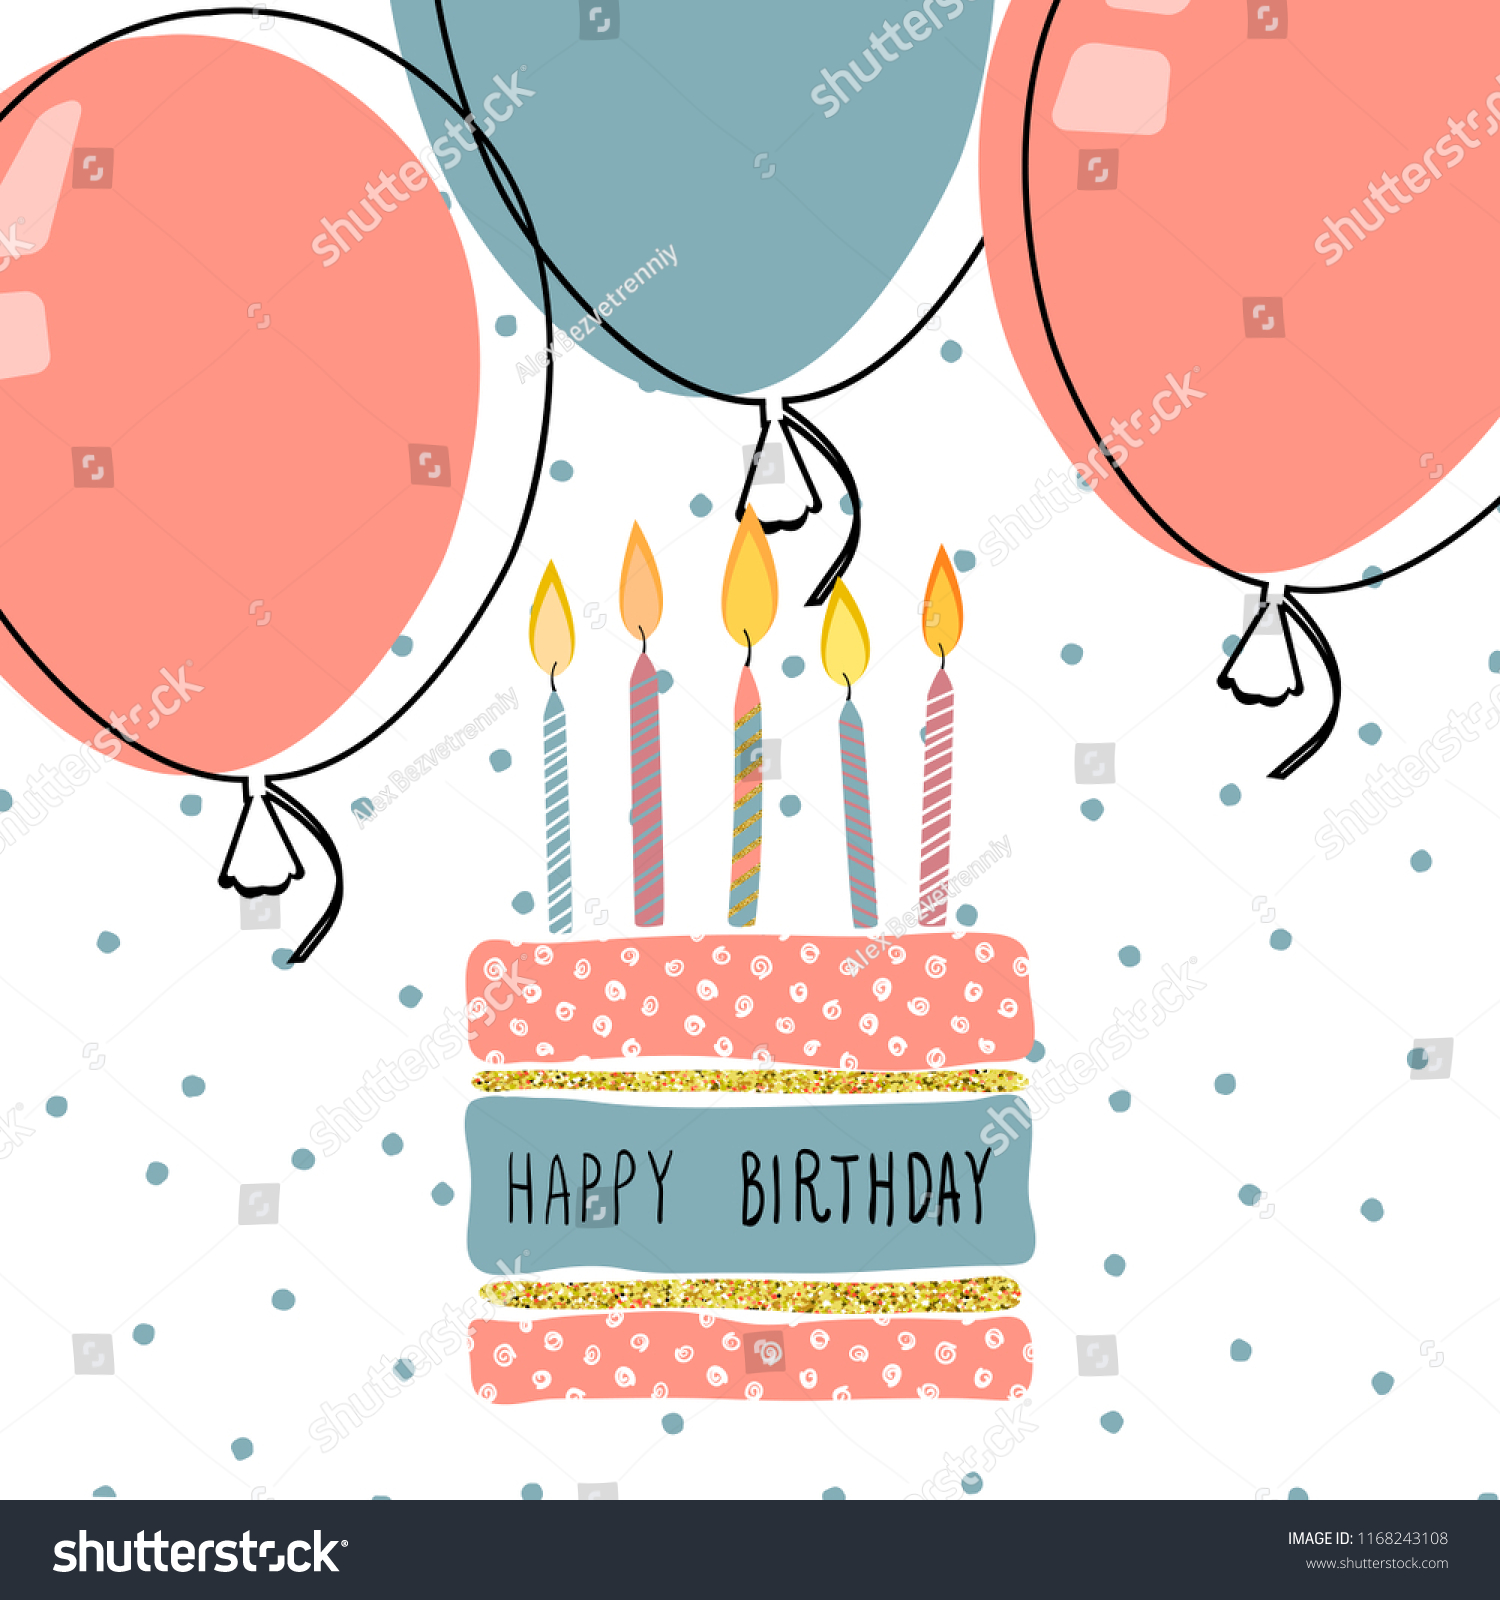 Modern Happy Birthday Greeting Cards Design